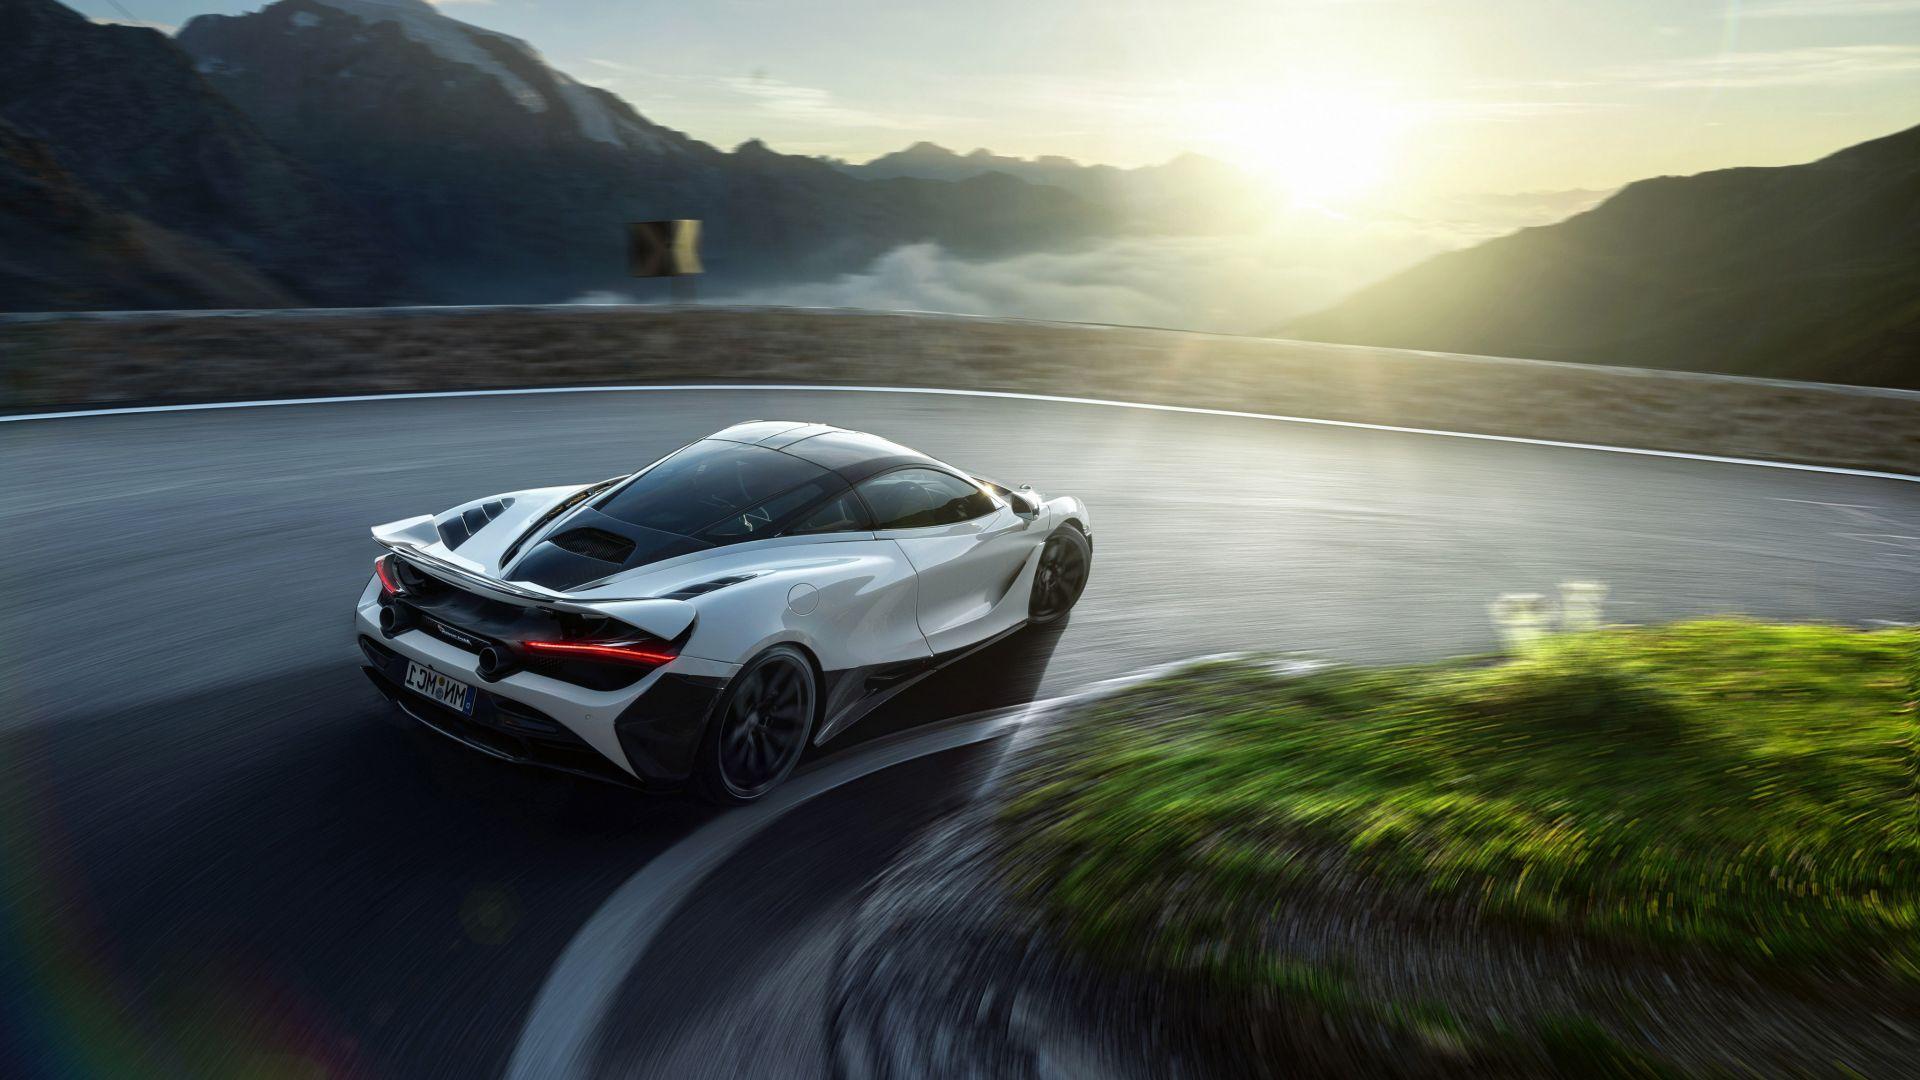 Wallpaper McLaren 720S, supercar, 2019 Cars, 4K, Cars ...